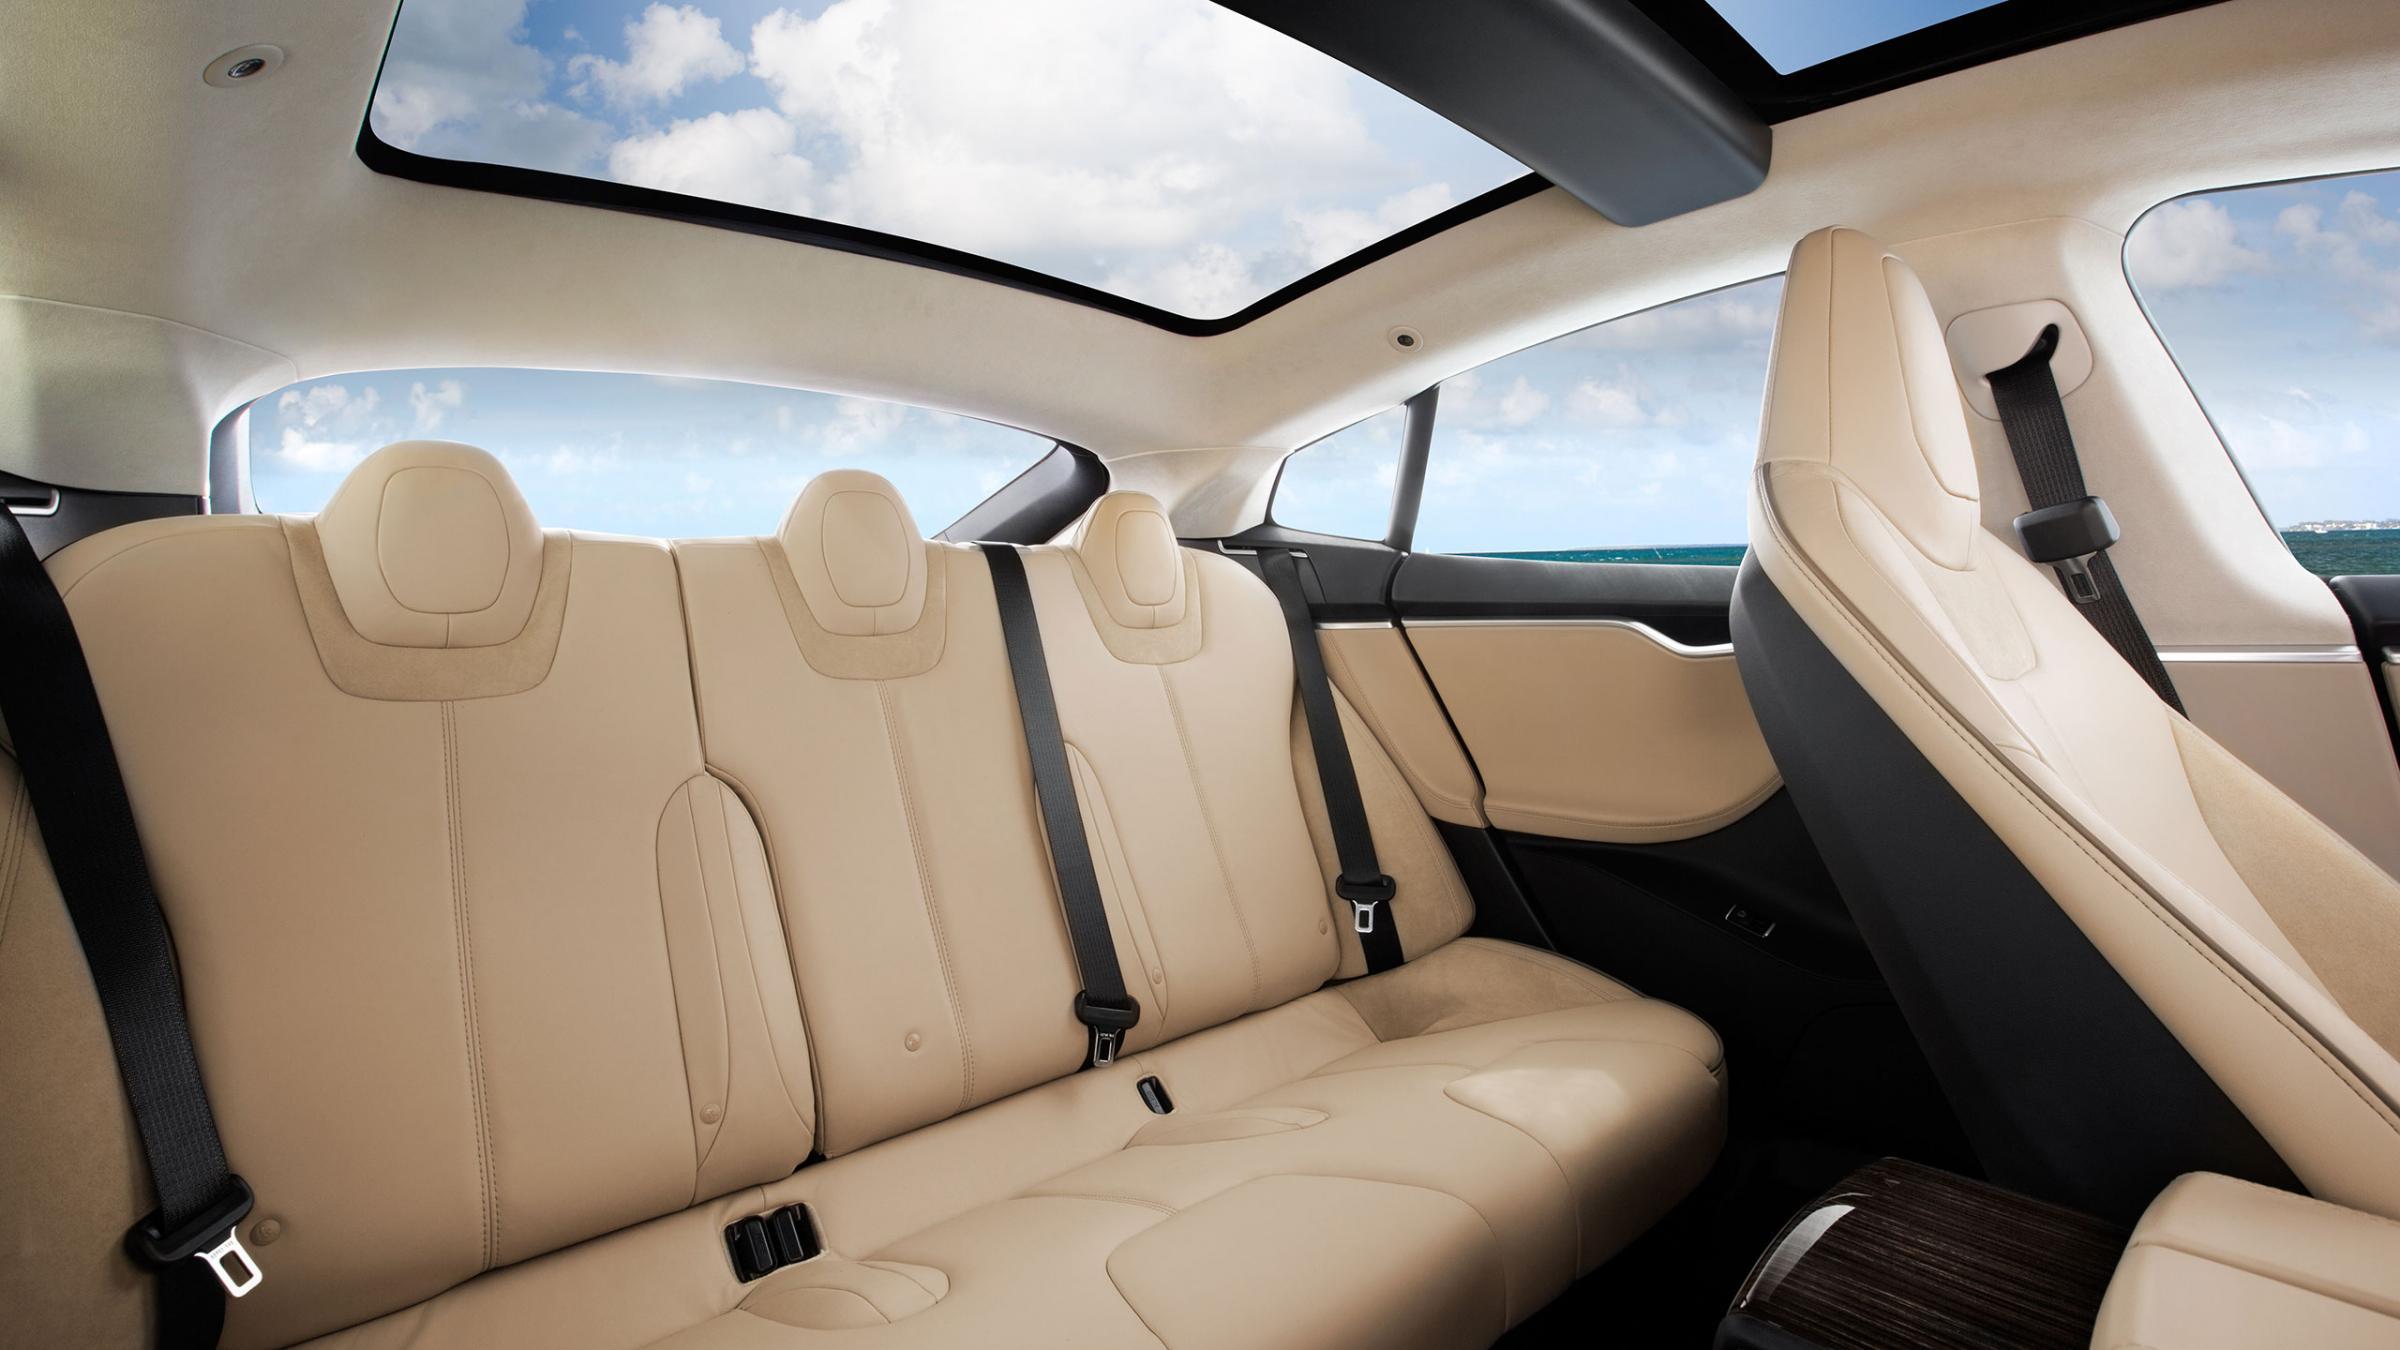 2012 Tesla Model S interior